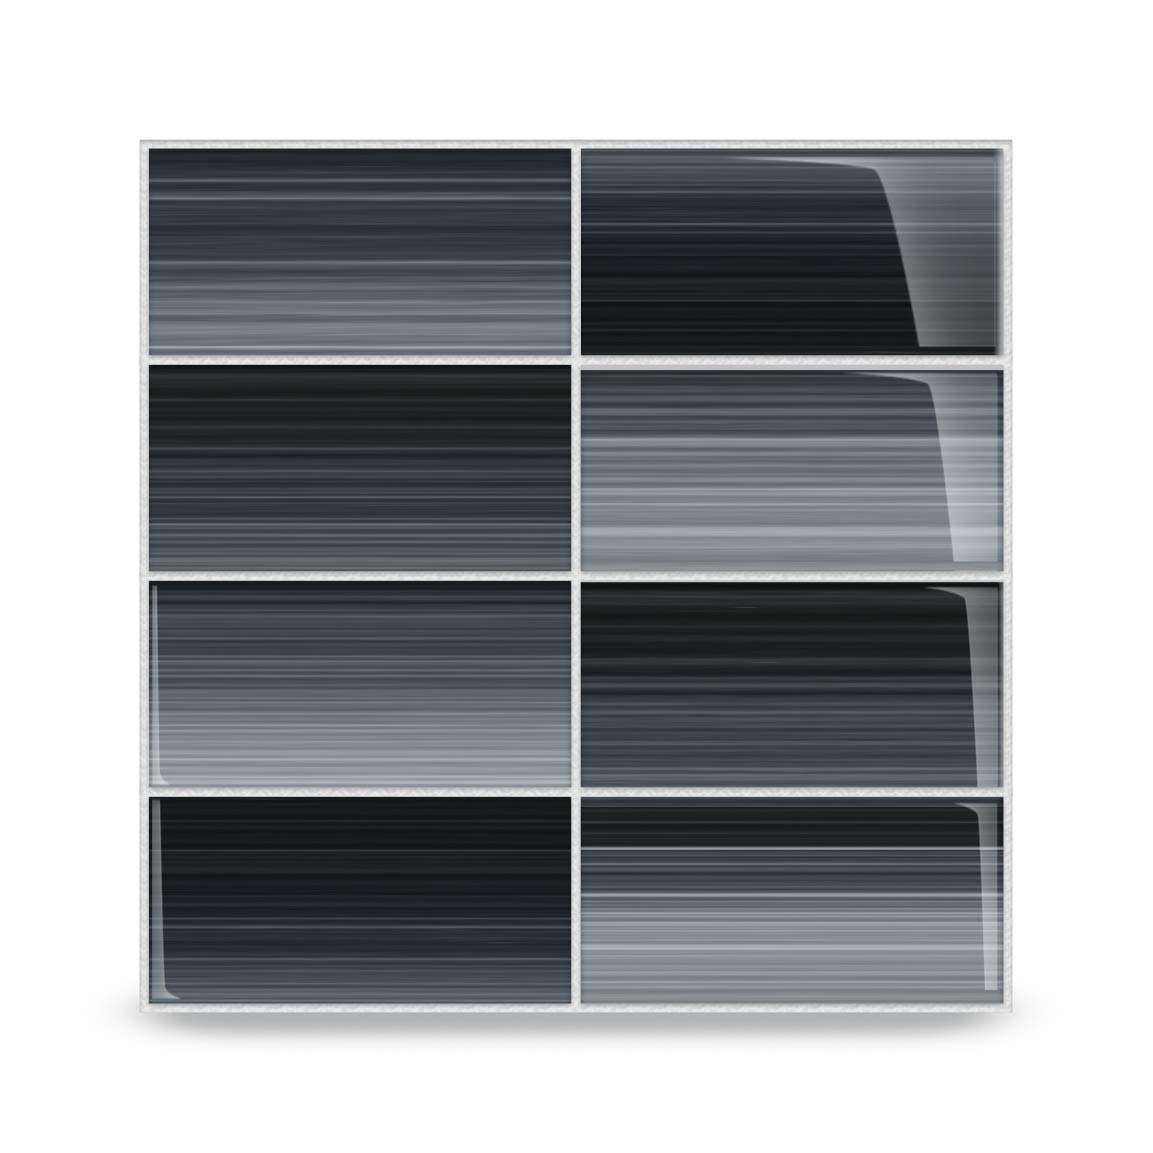 Bodesi - Late Night Glass Subway Tile for Kitchen Backsplash or Bathroom, 3x6 (5 Sq Ft Box)